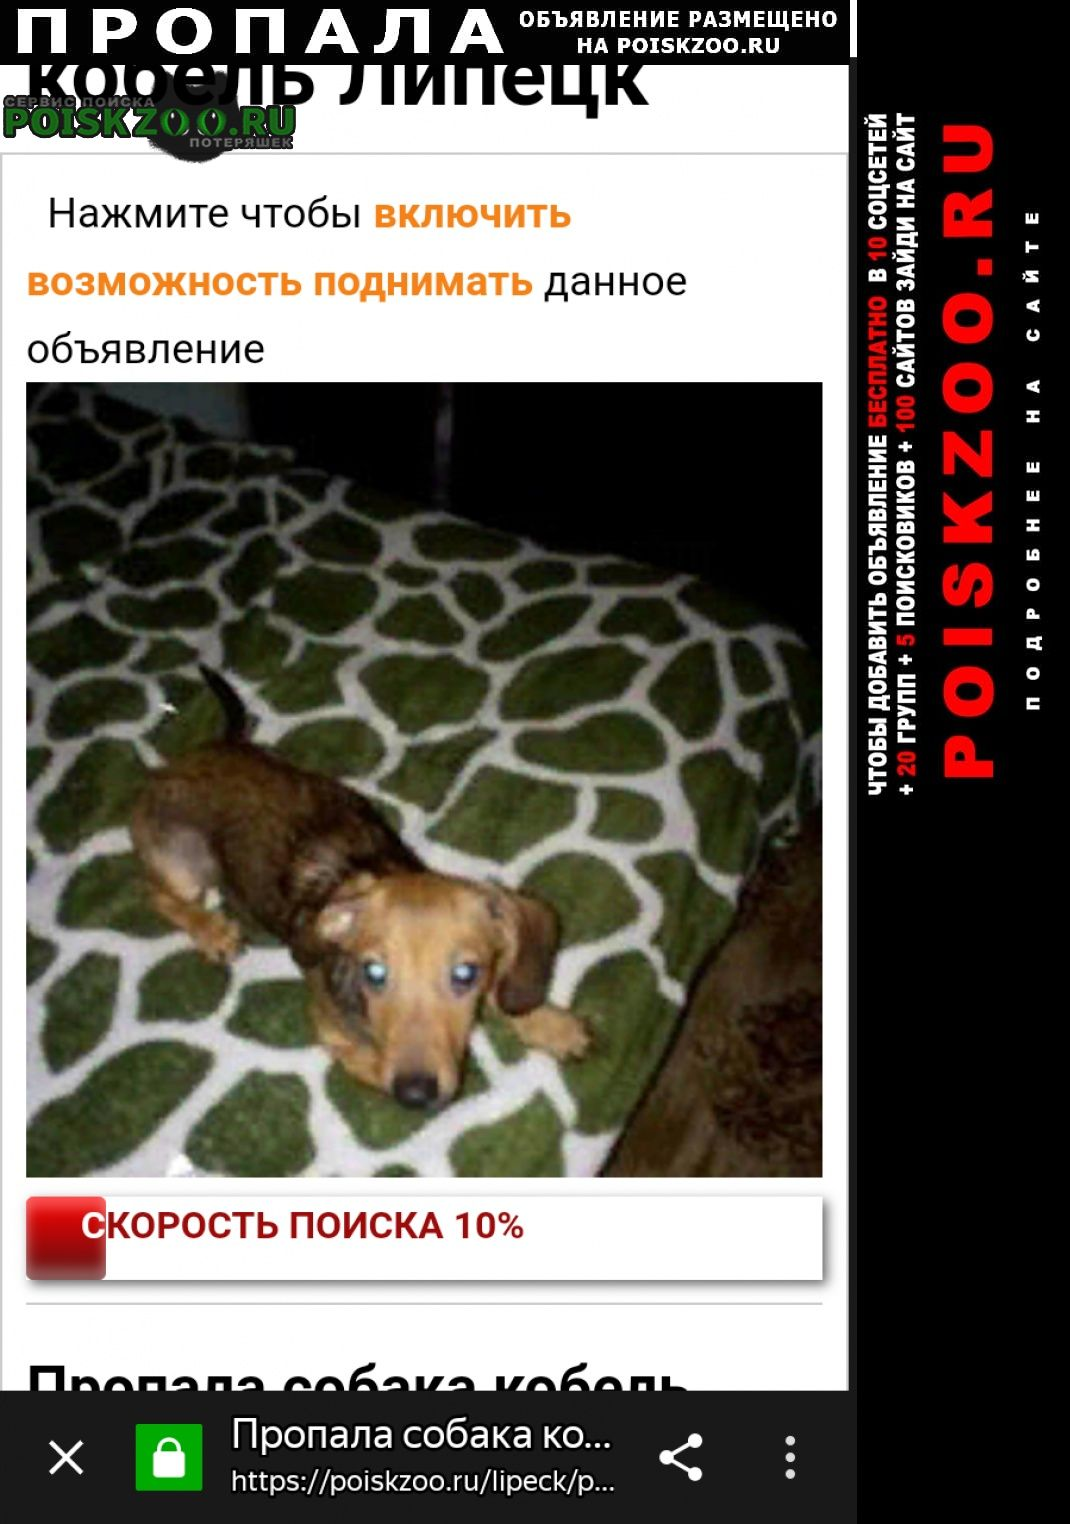 Пропала собака Липецк